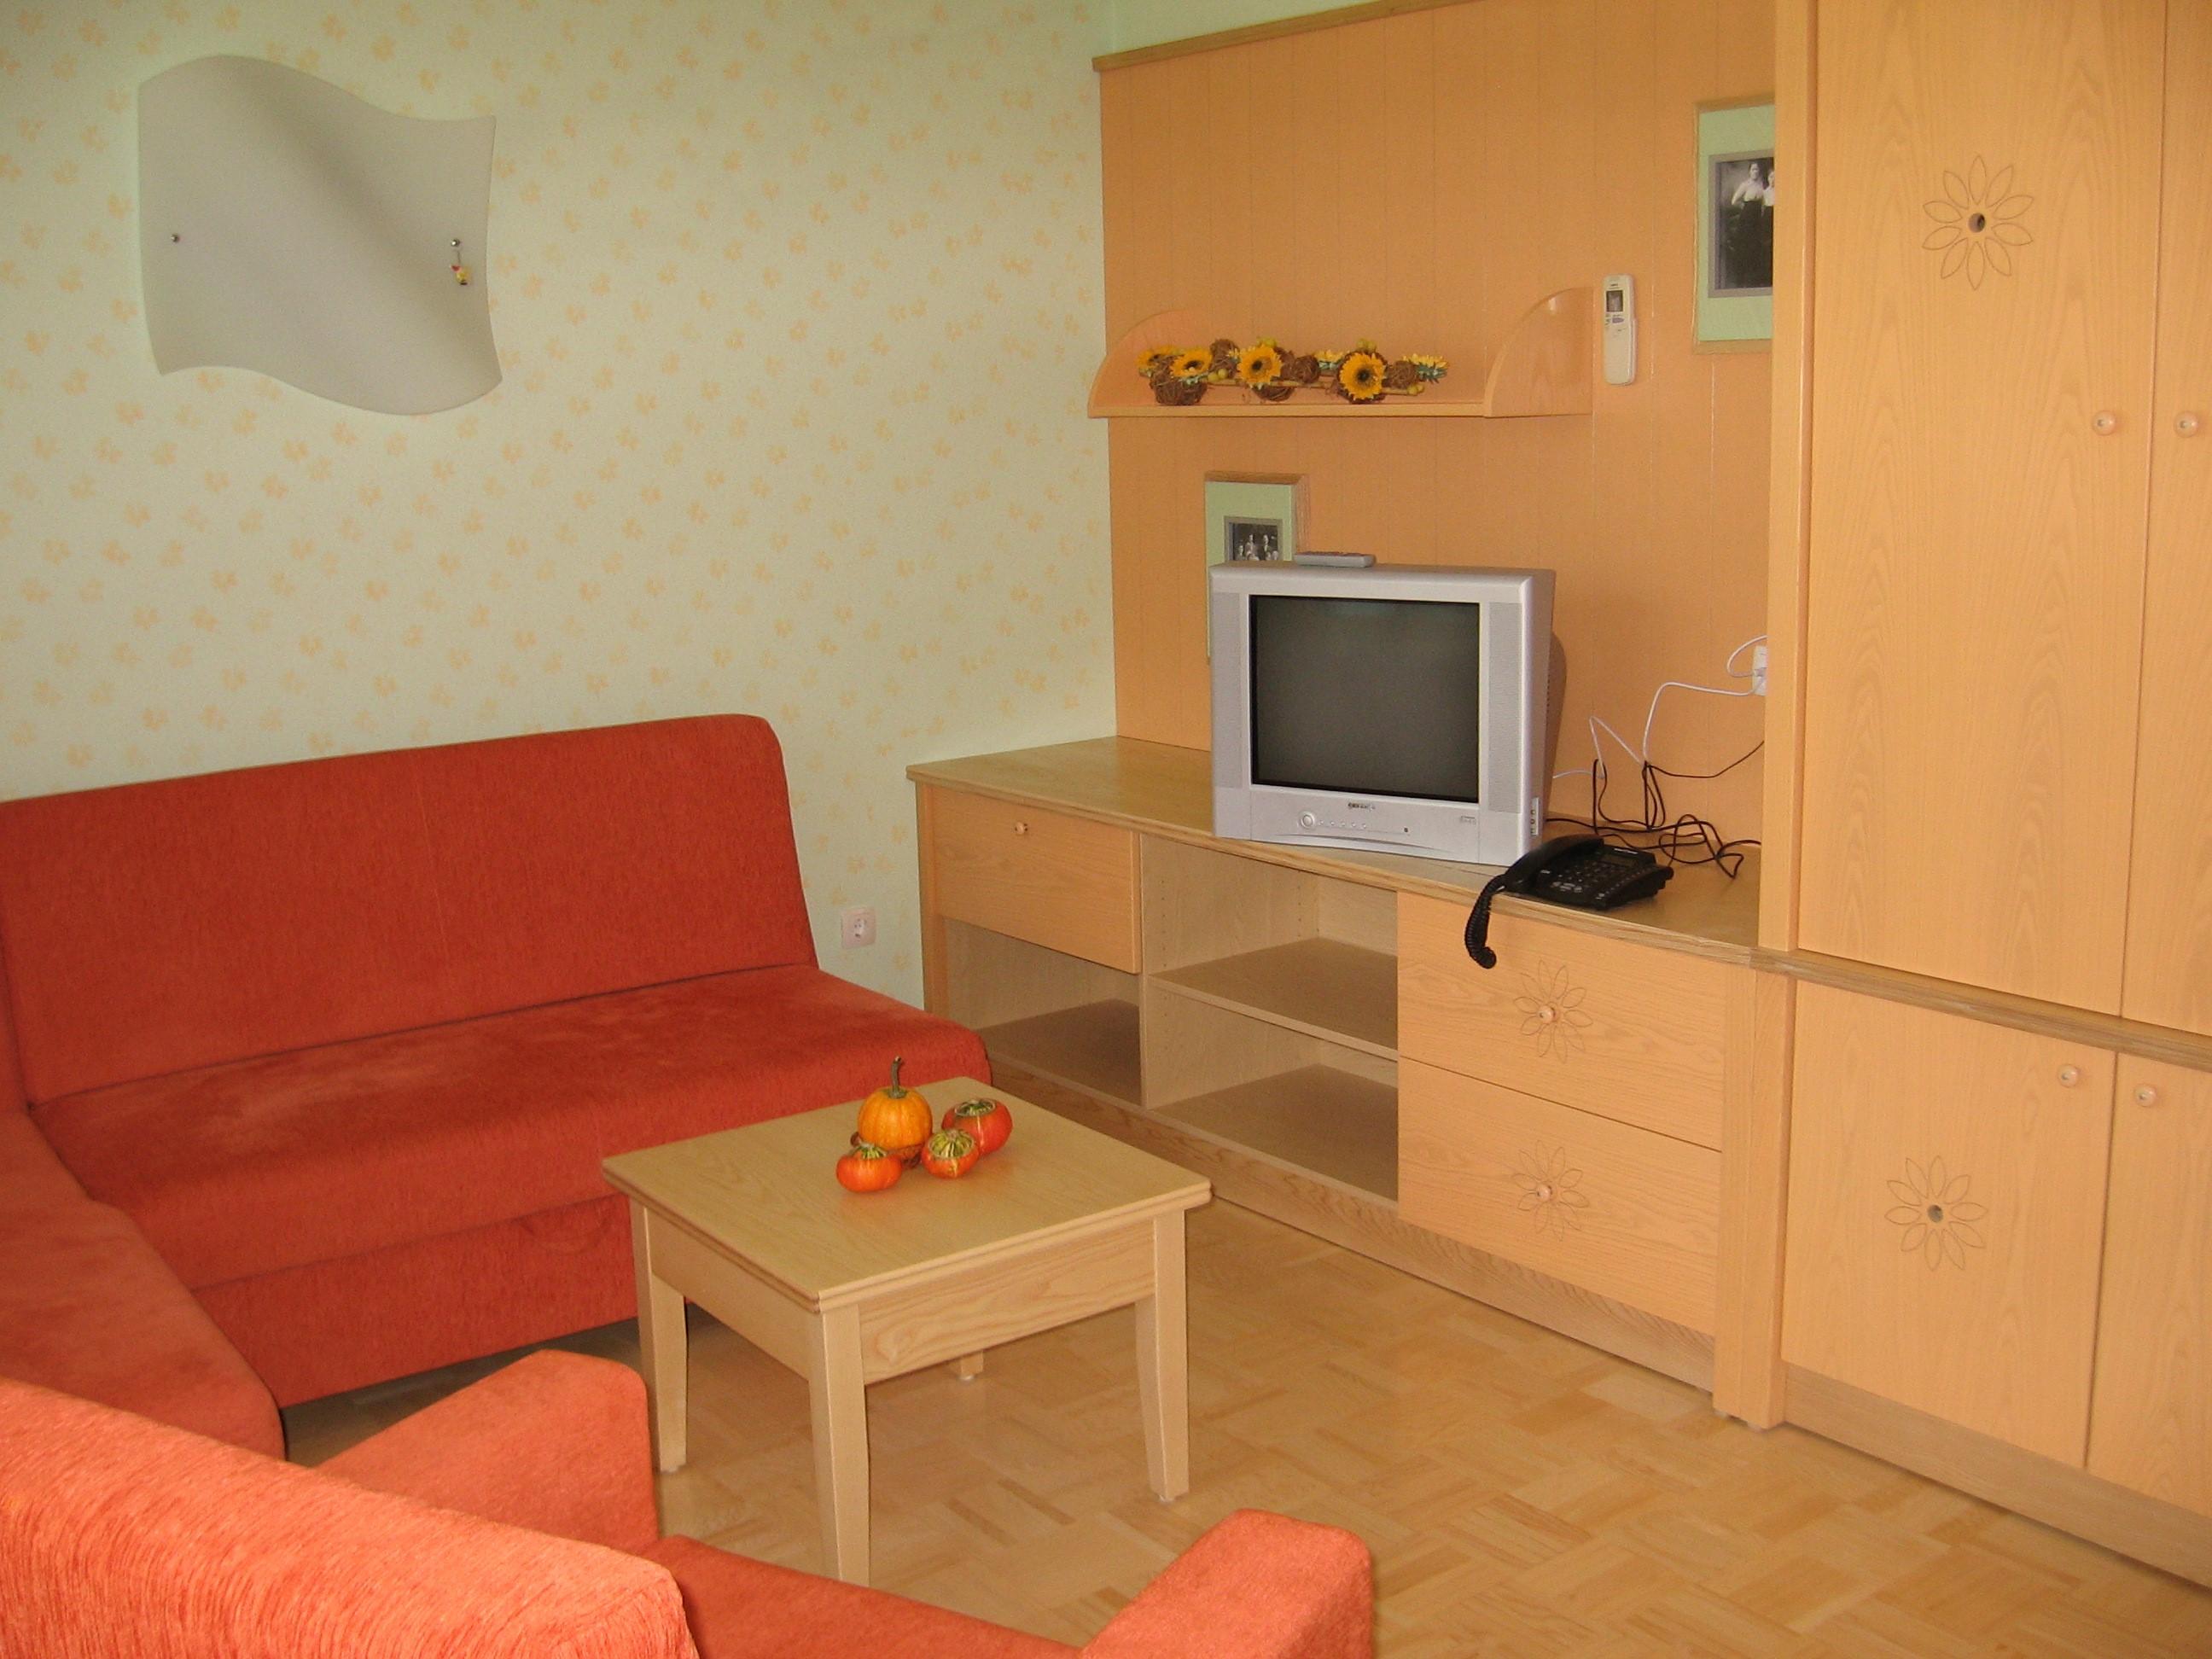 Apartment - Living room 1